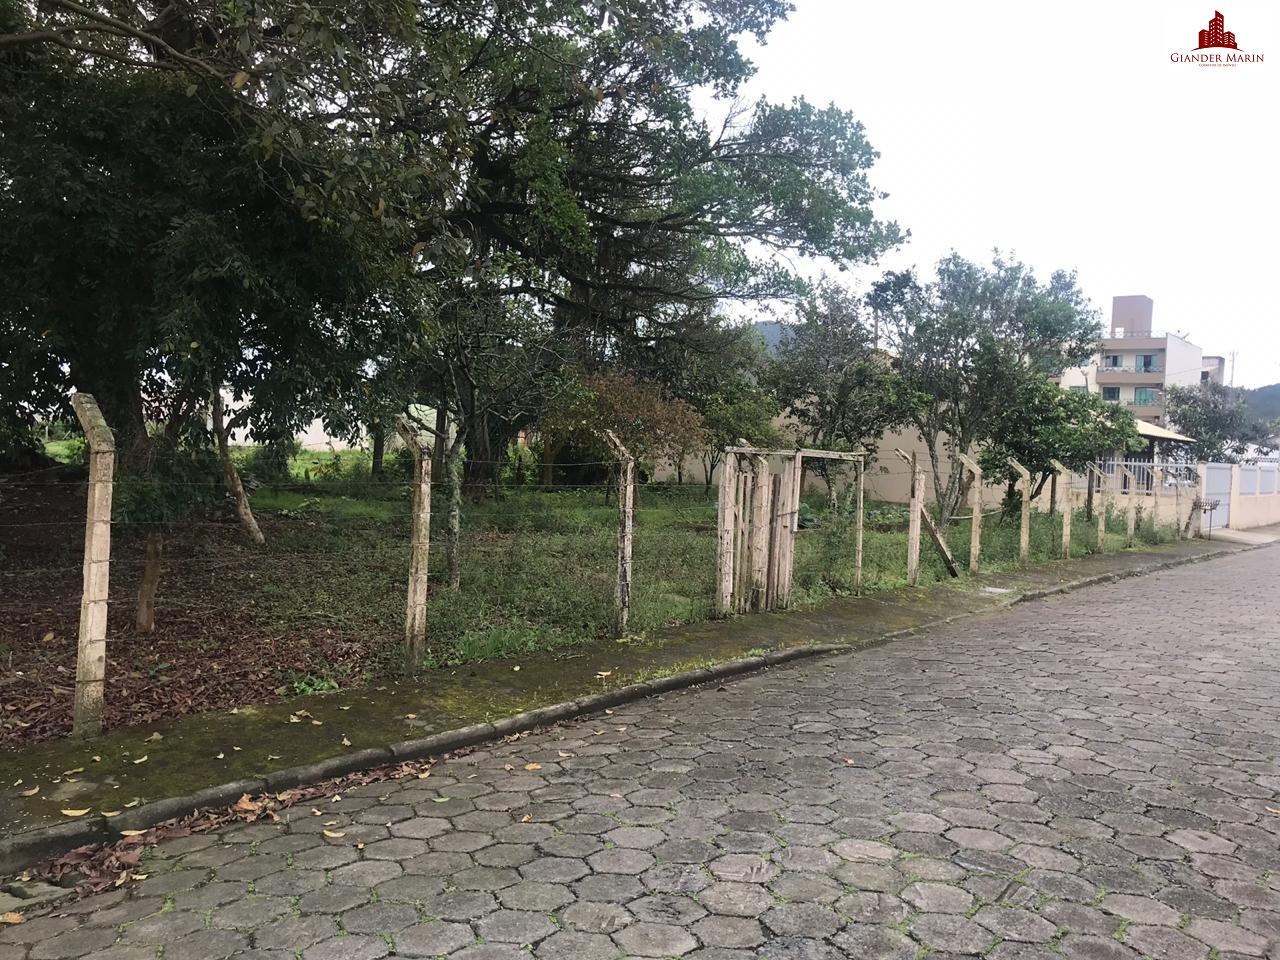 TERRENO RESIDENCIAL em NAVEGANTES - SC, gravata